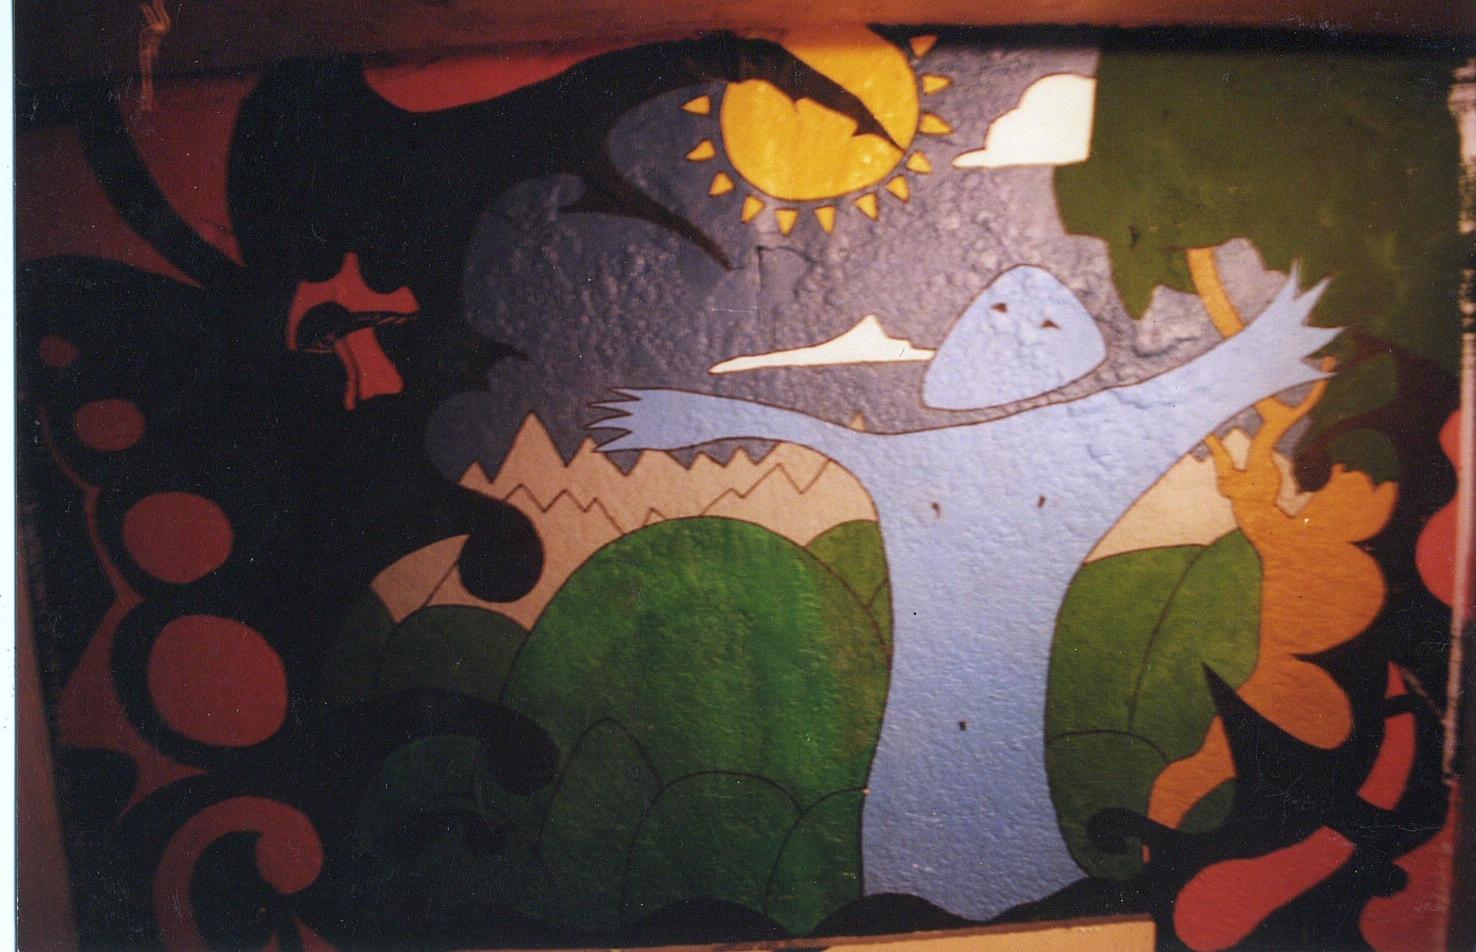 Ballard Playhouse Room Mural, Seattle WA